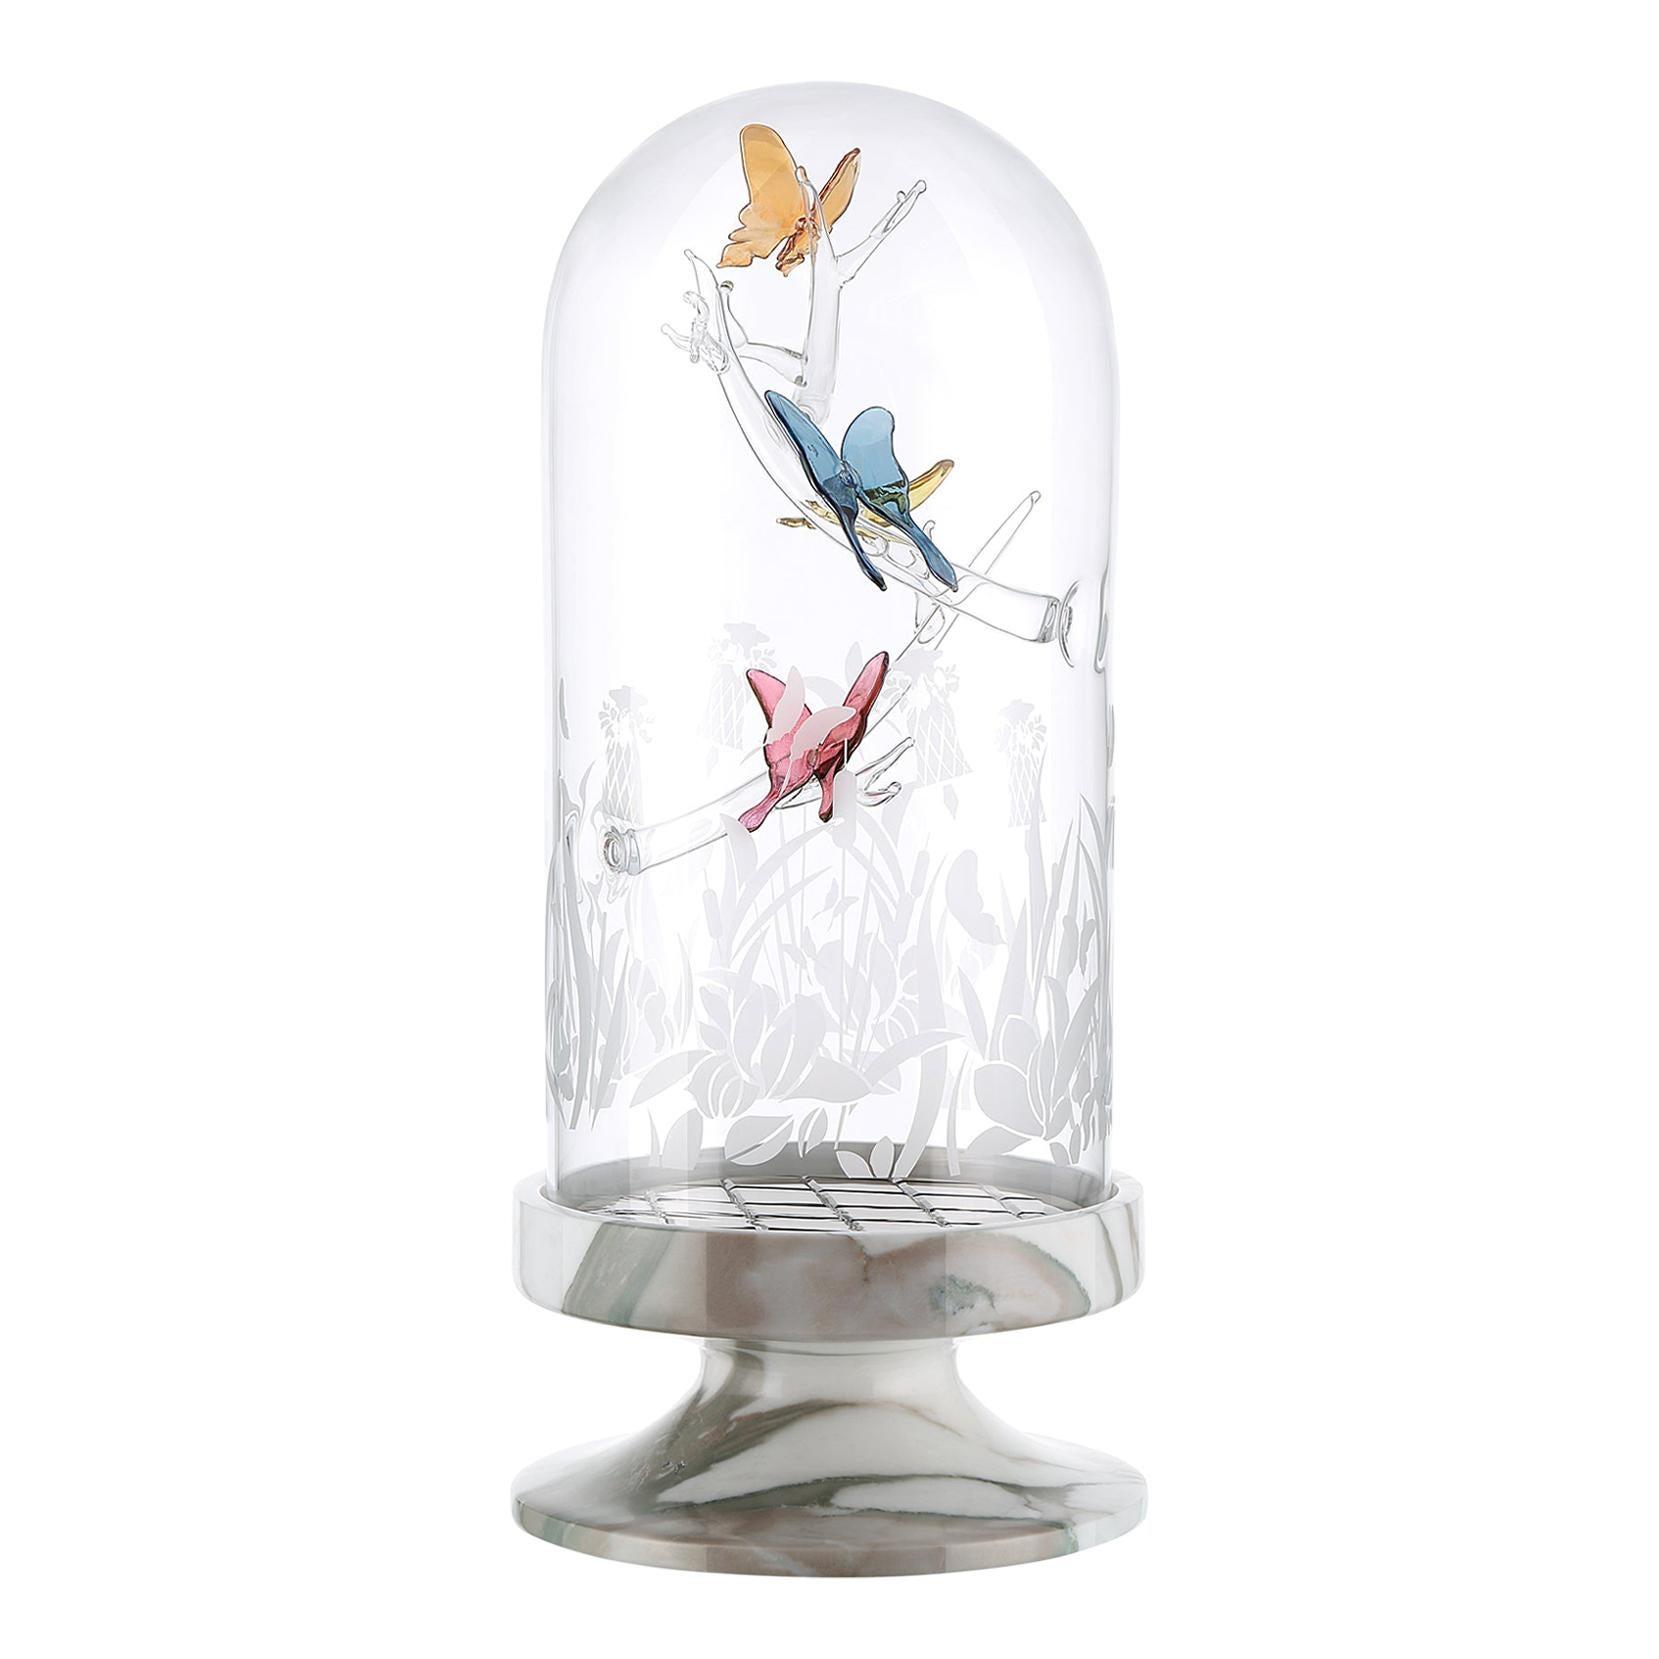 Artistic Handmade Table Lamp Jardin De Verre, by A. La Spada and La Murrina